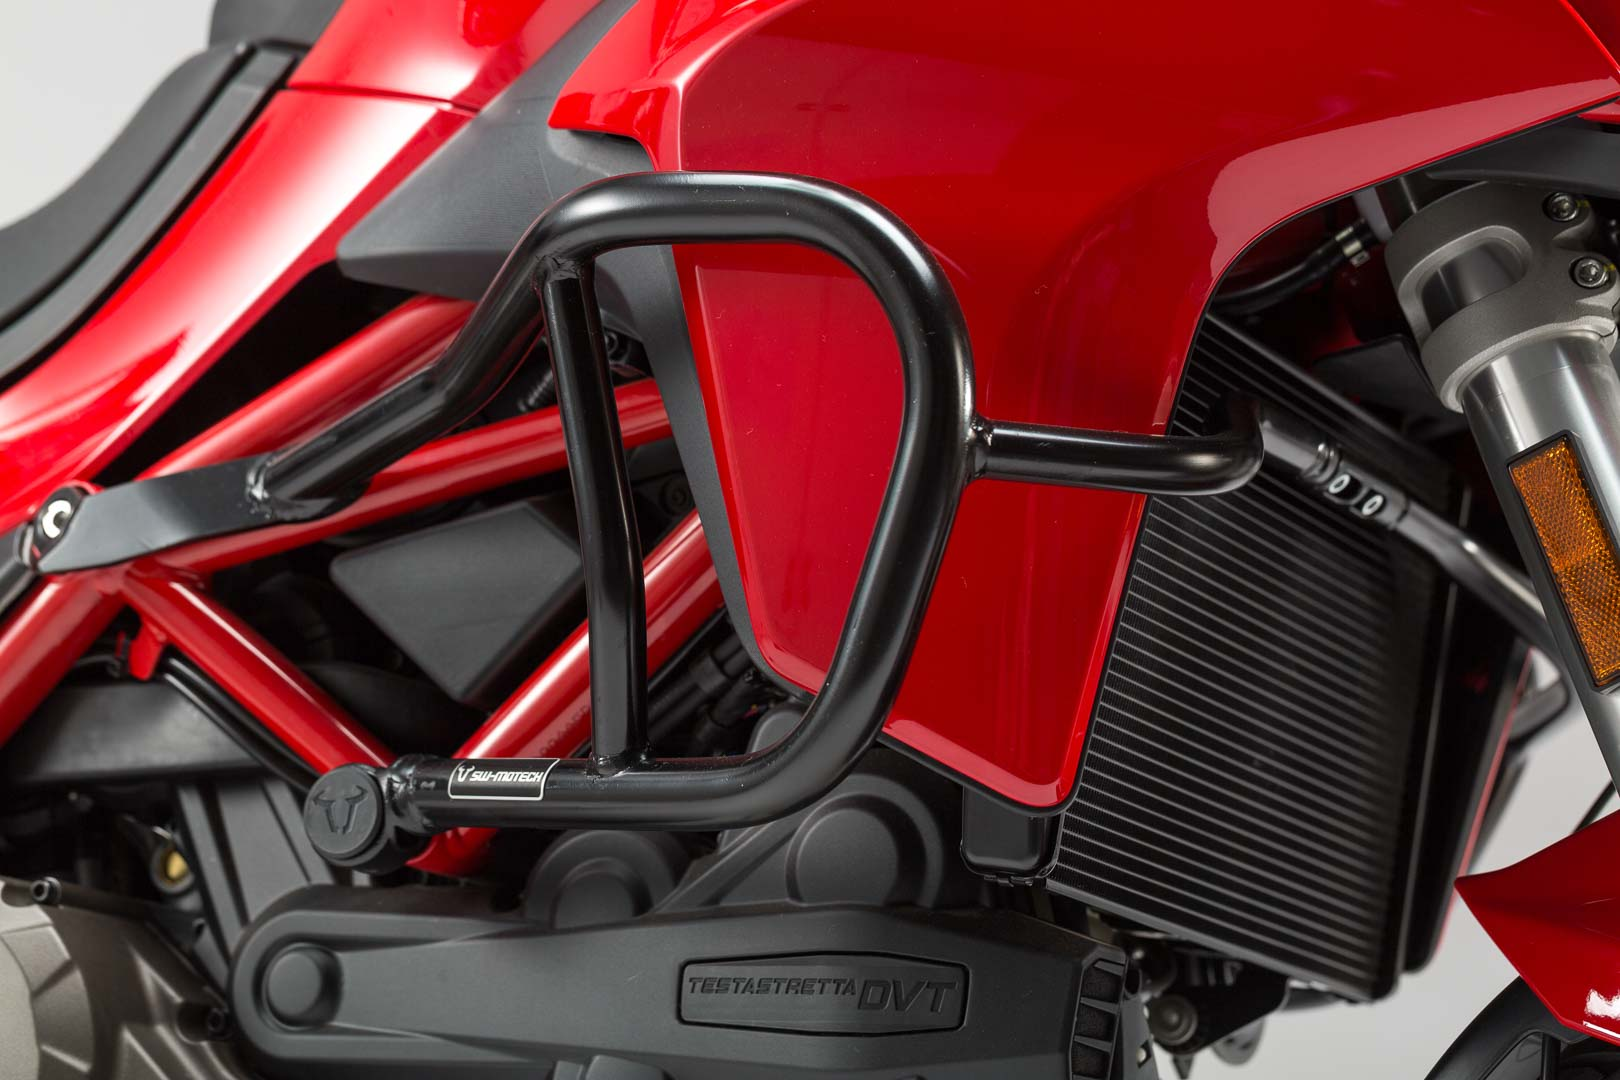 Moottorinsuojarauta Ducati Multistrada 950/1200/1260 15-20